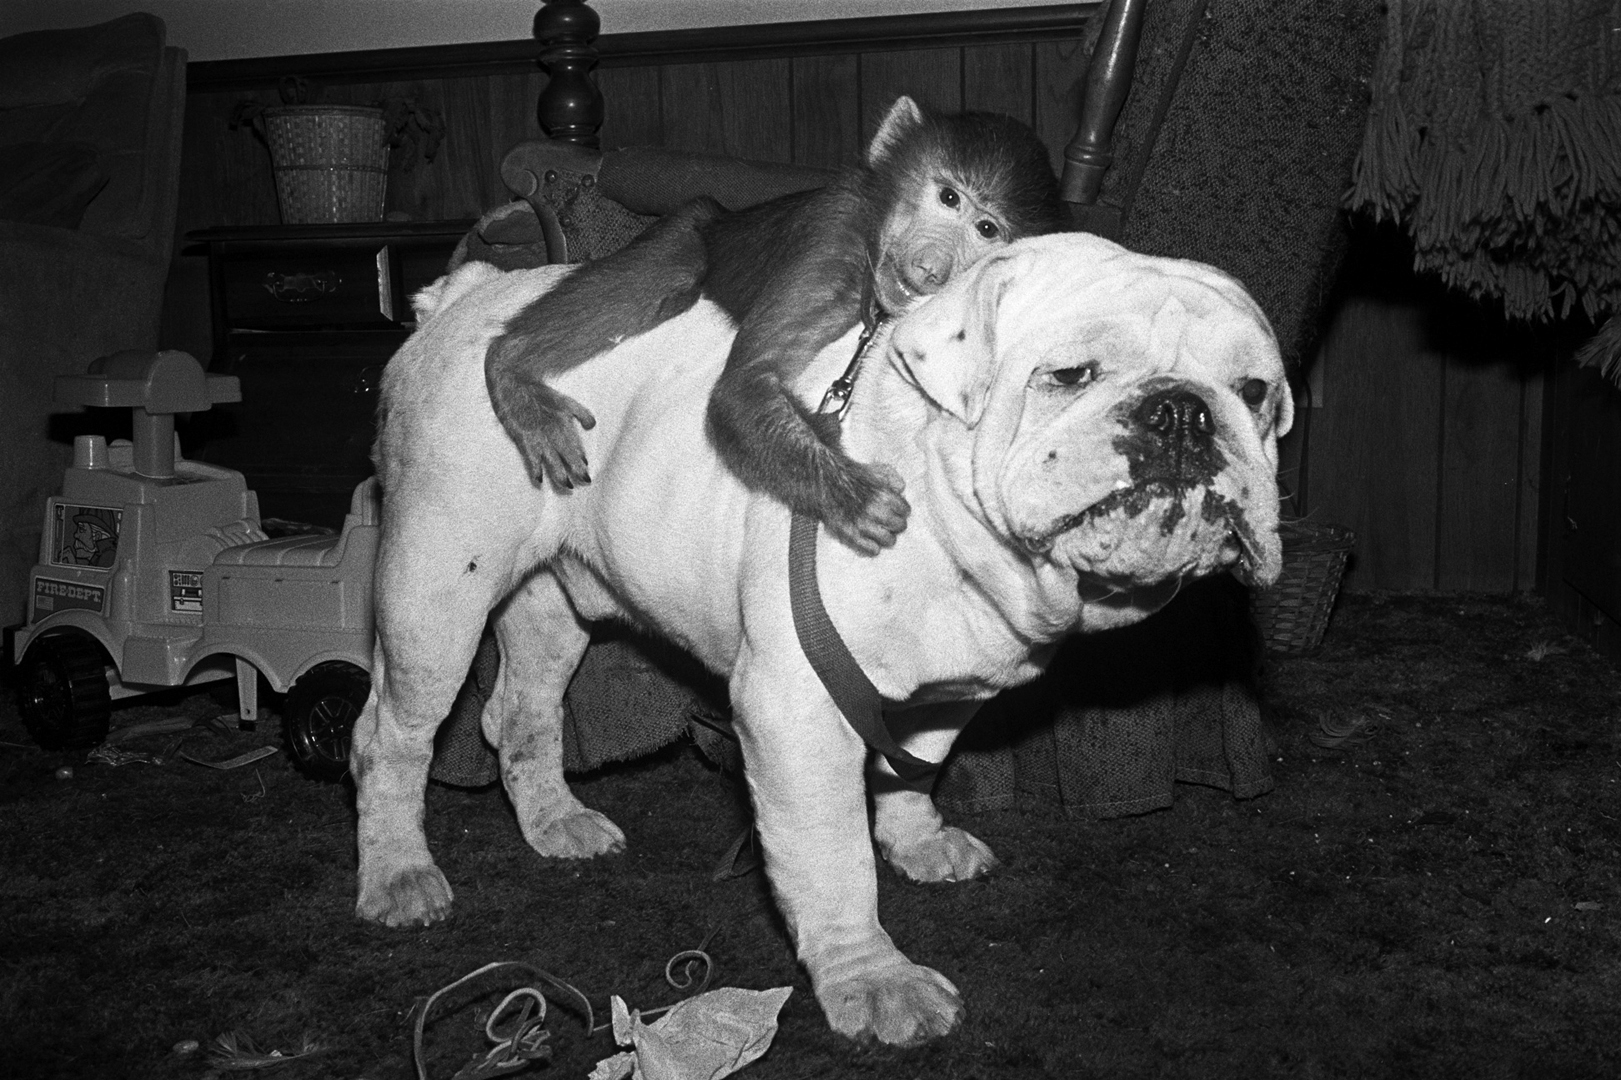 Jake and Mugs, 1990. Hamadrayas Baboon, male, 1 year old and                                 English bull dog, male, 4 years old.